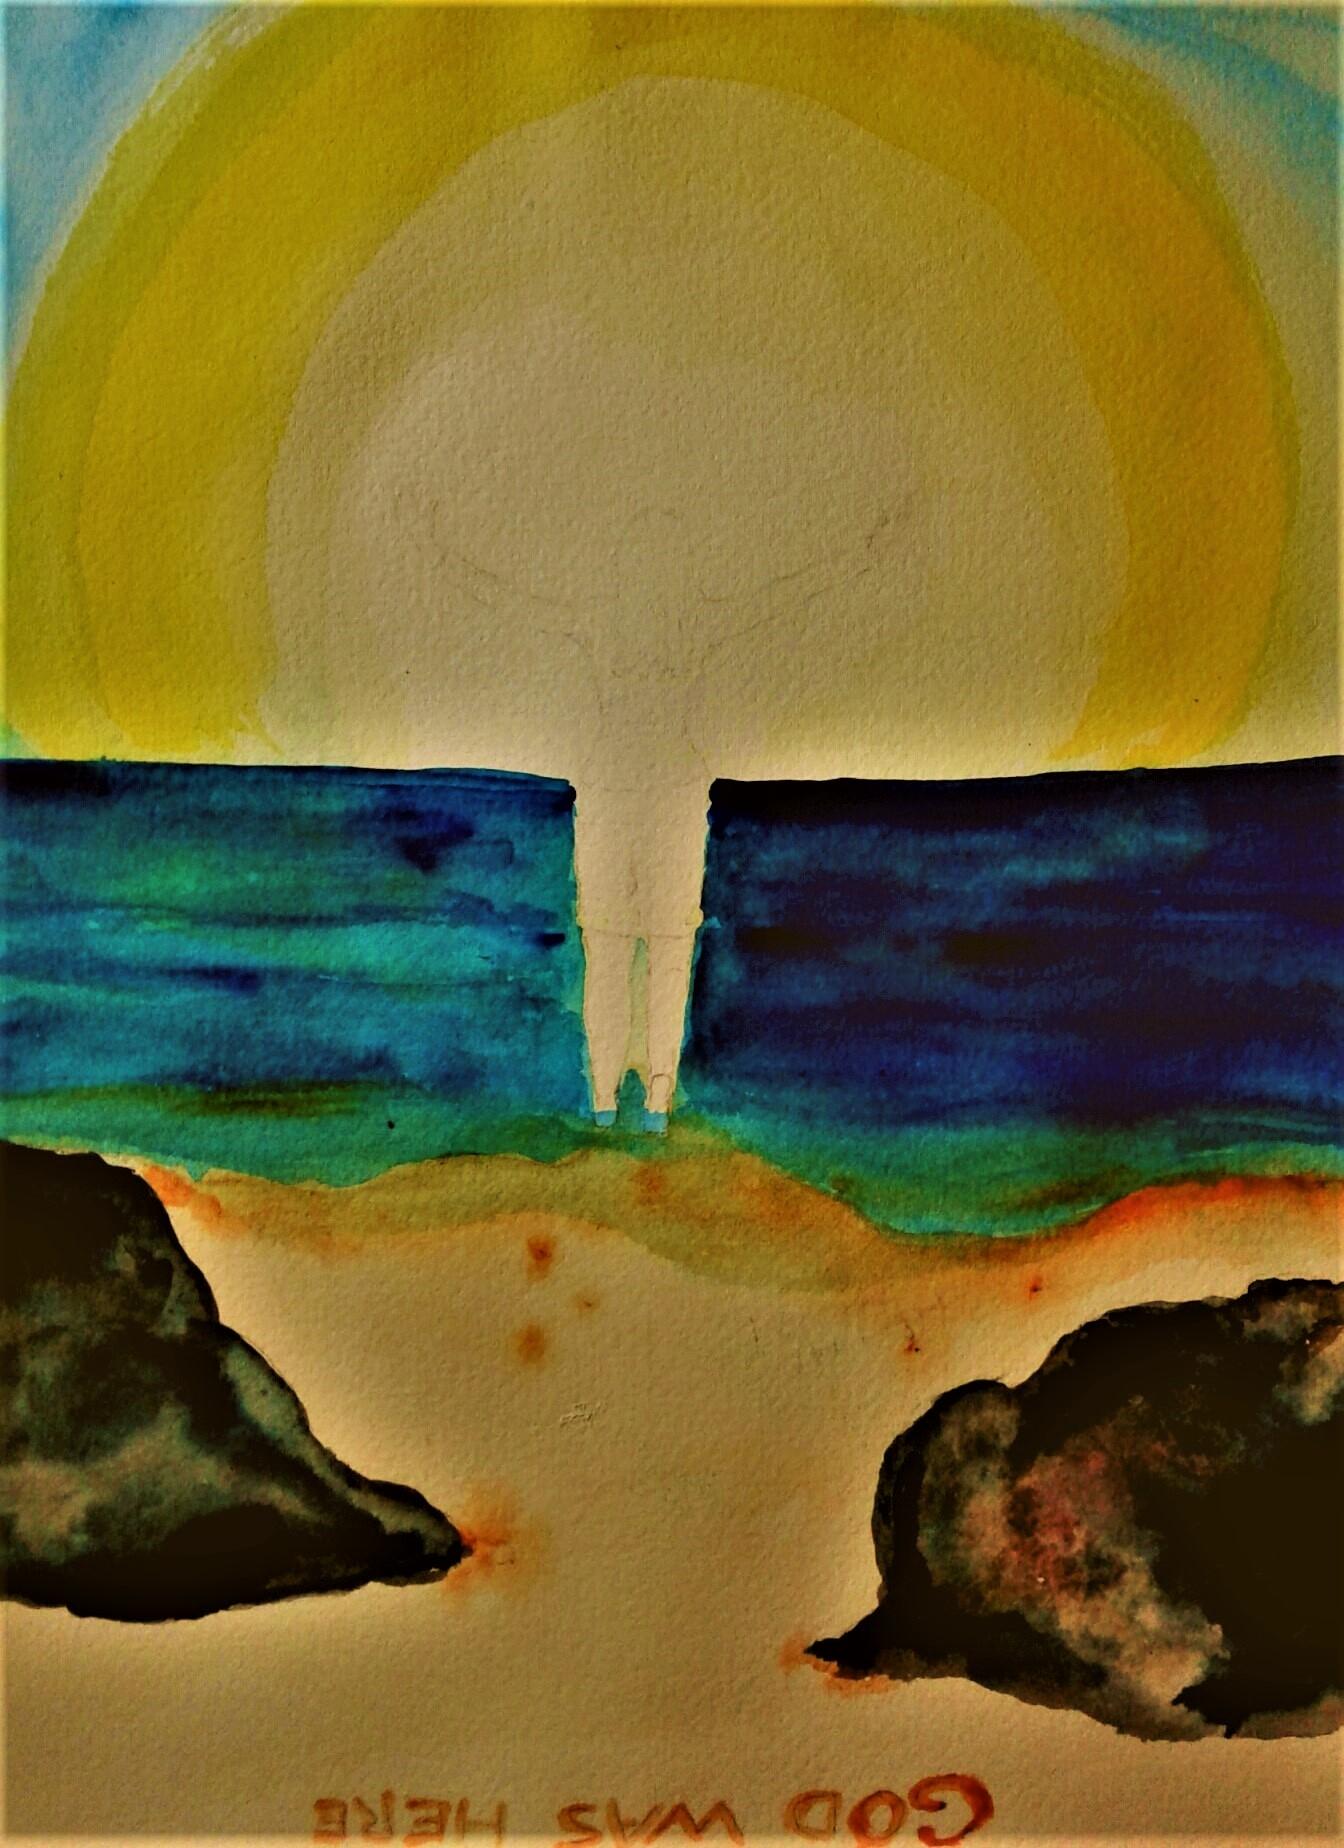 SOLAR PLEXUS CHARKA JOURNEY 2013